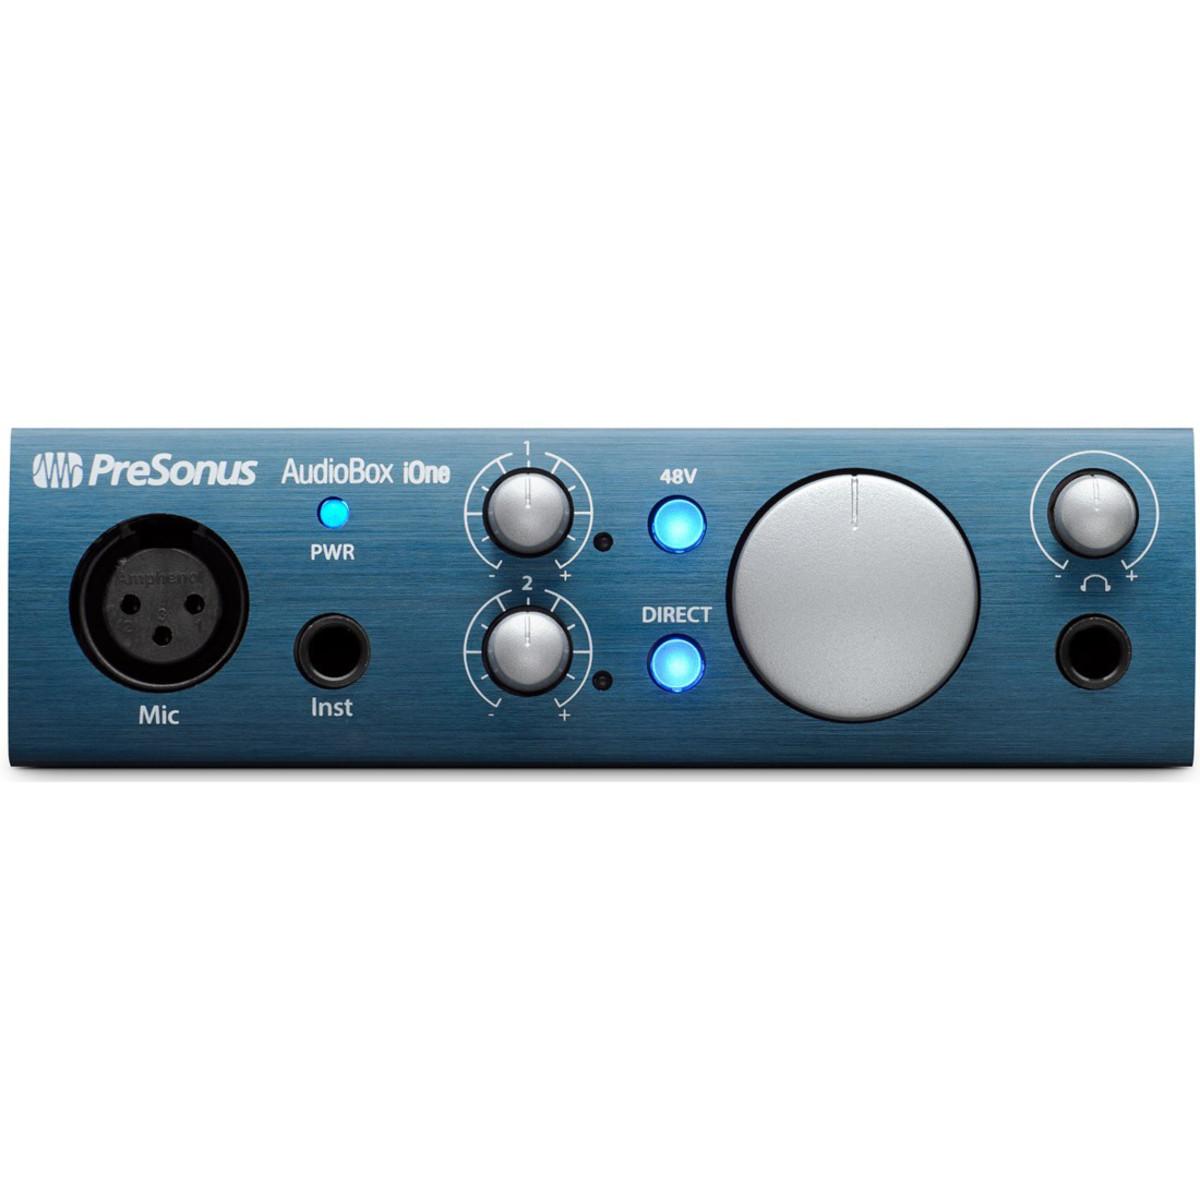 Presonus Audiobox Ione Ipad Usb Audio Interface